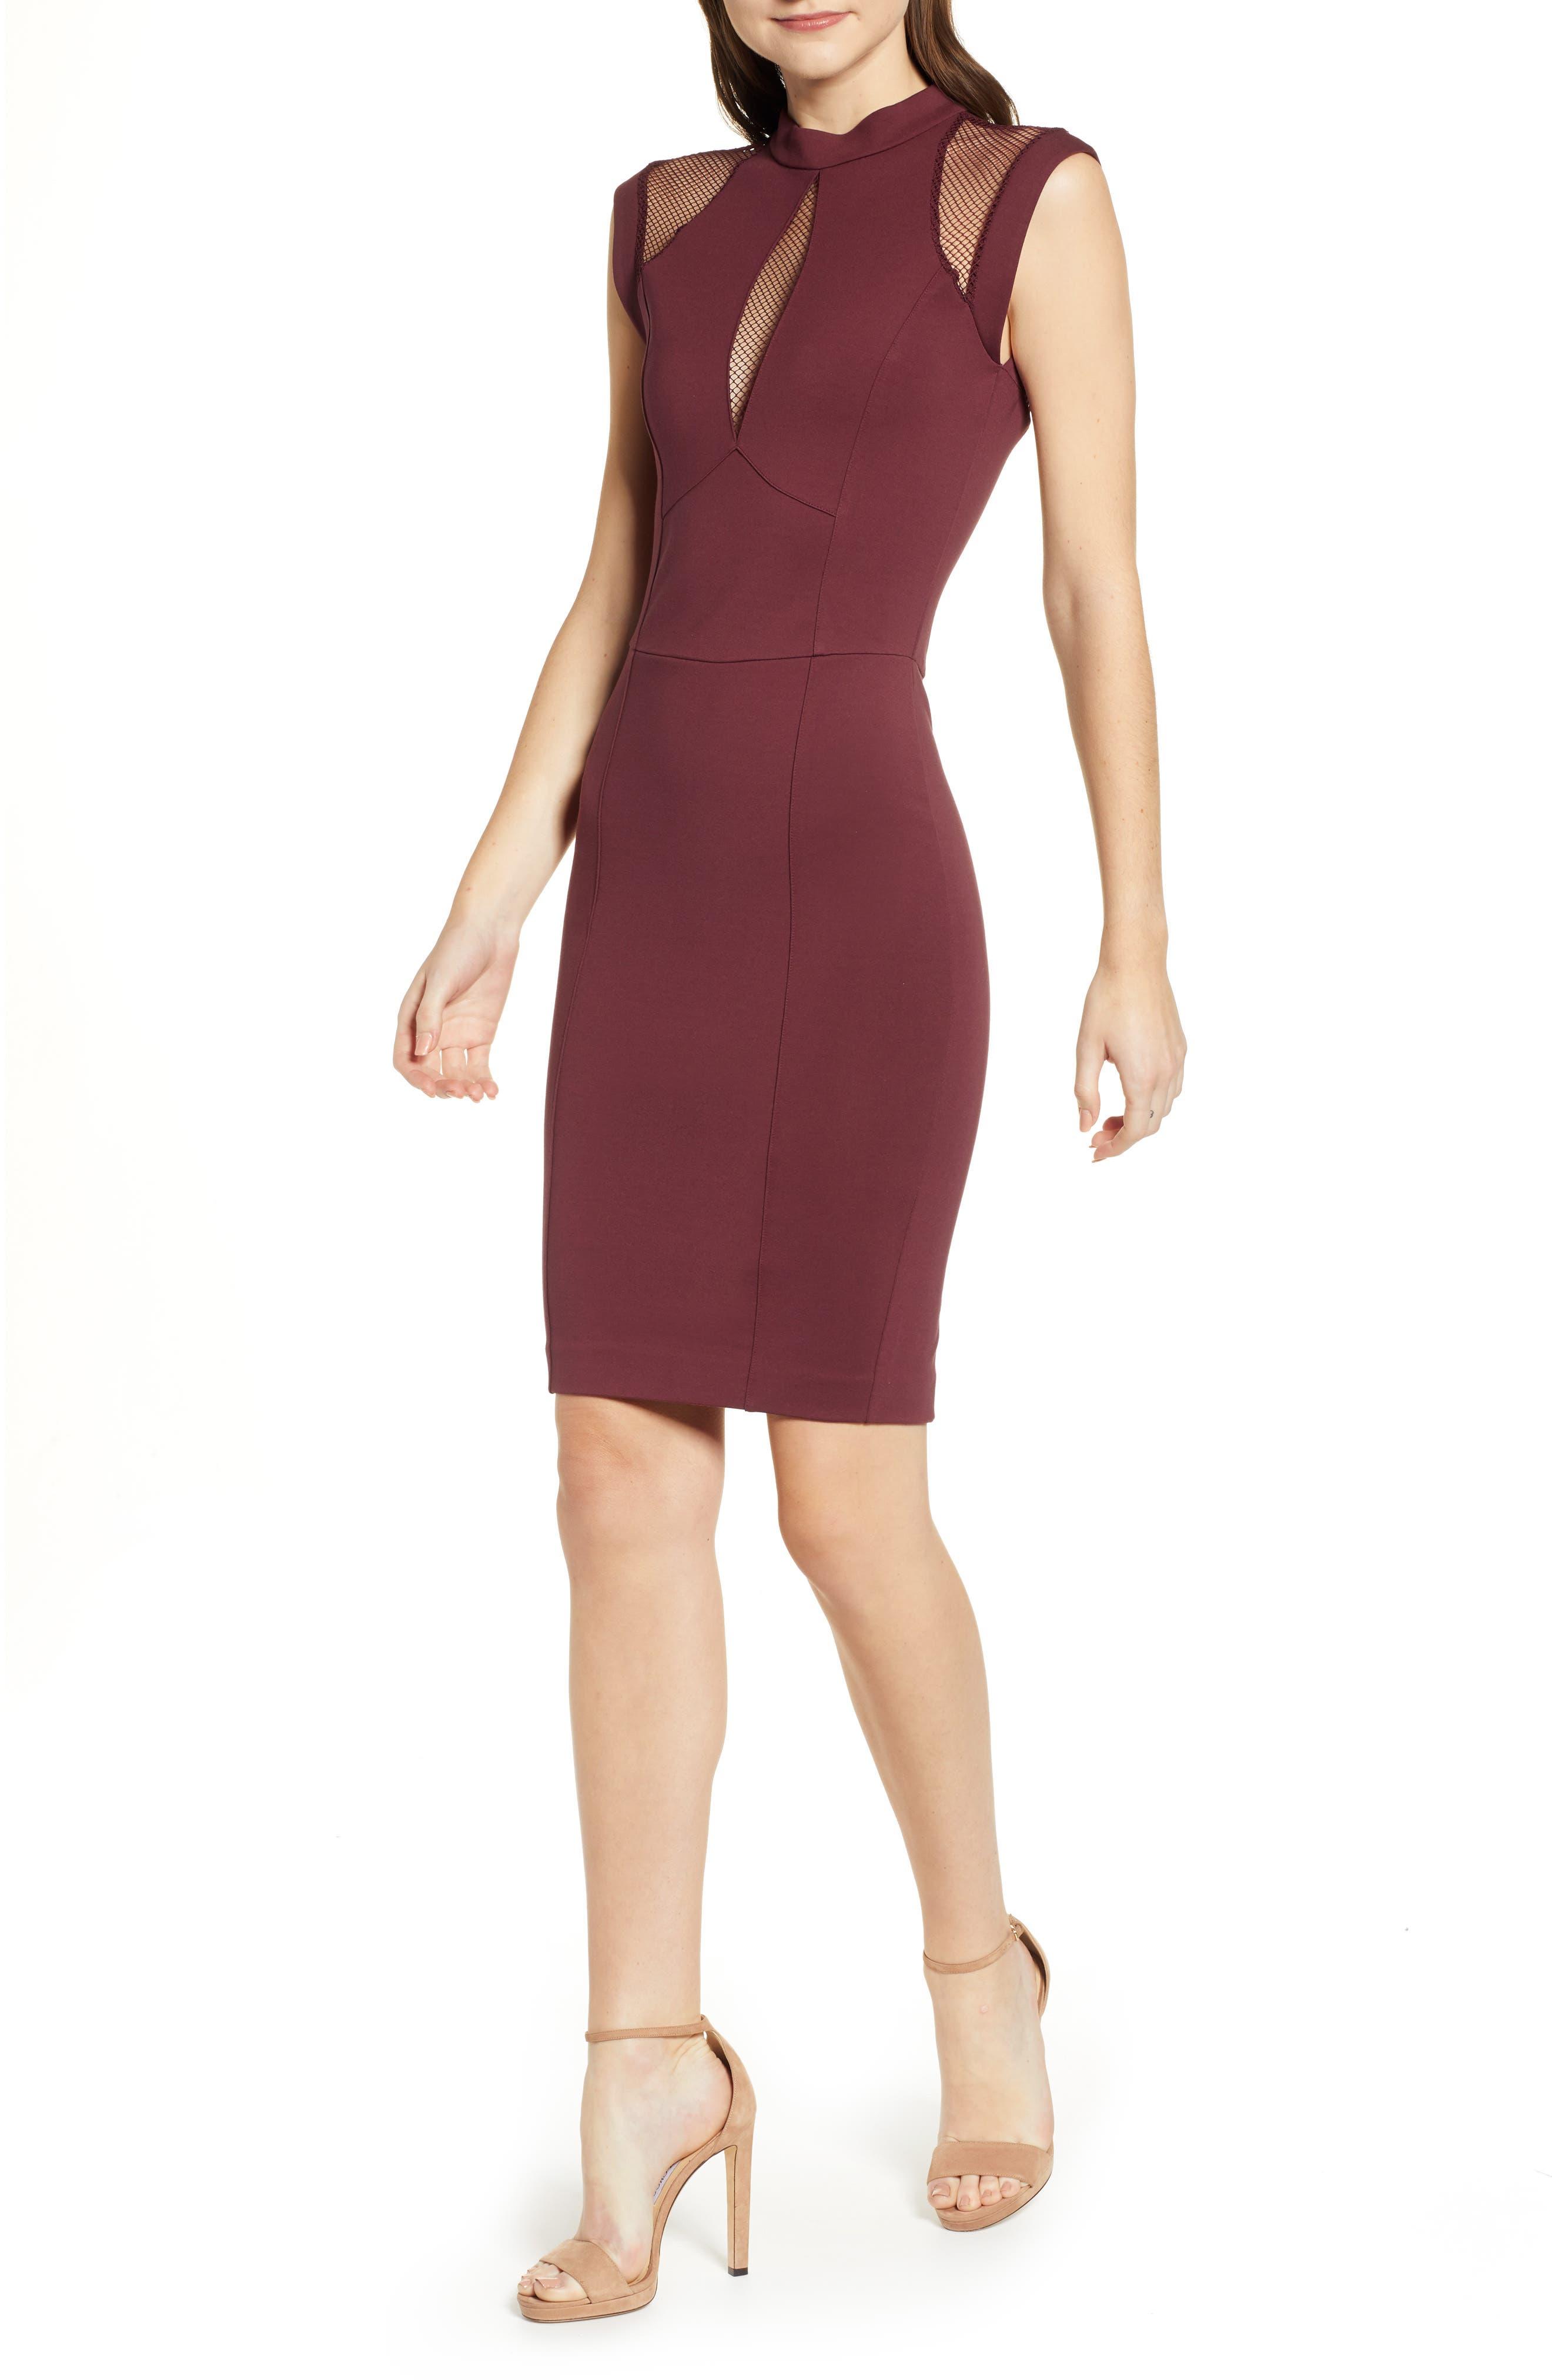 Sentimental Ny Galactica Body-Con Dress, Red